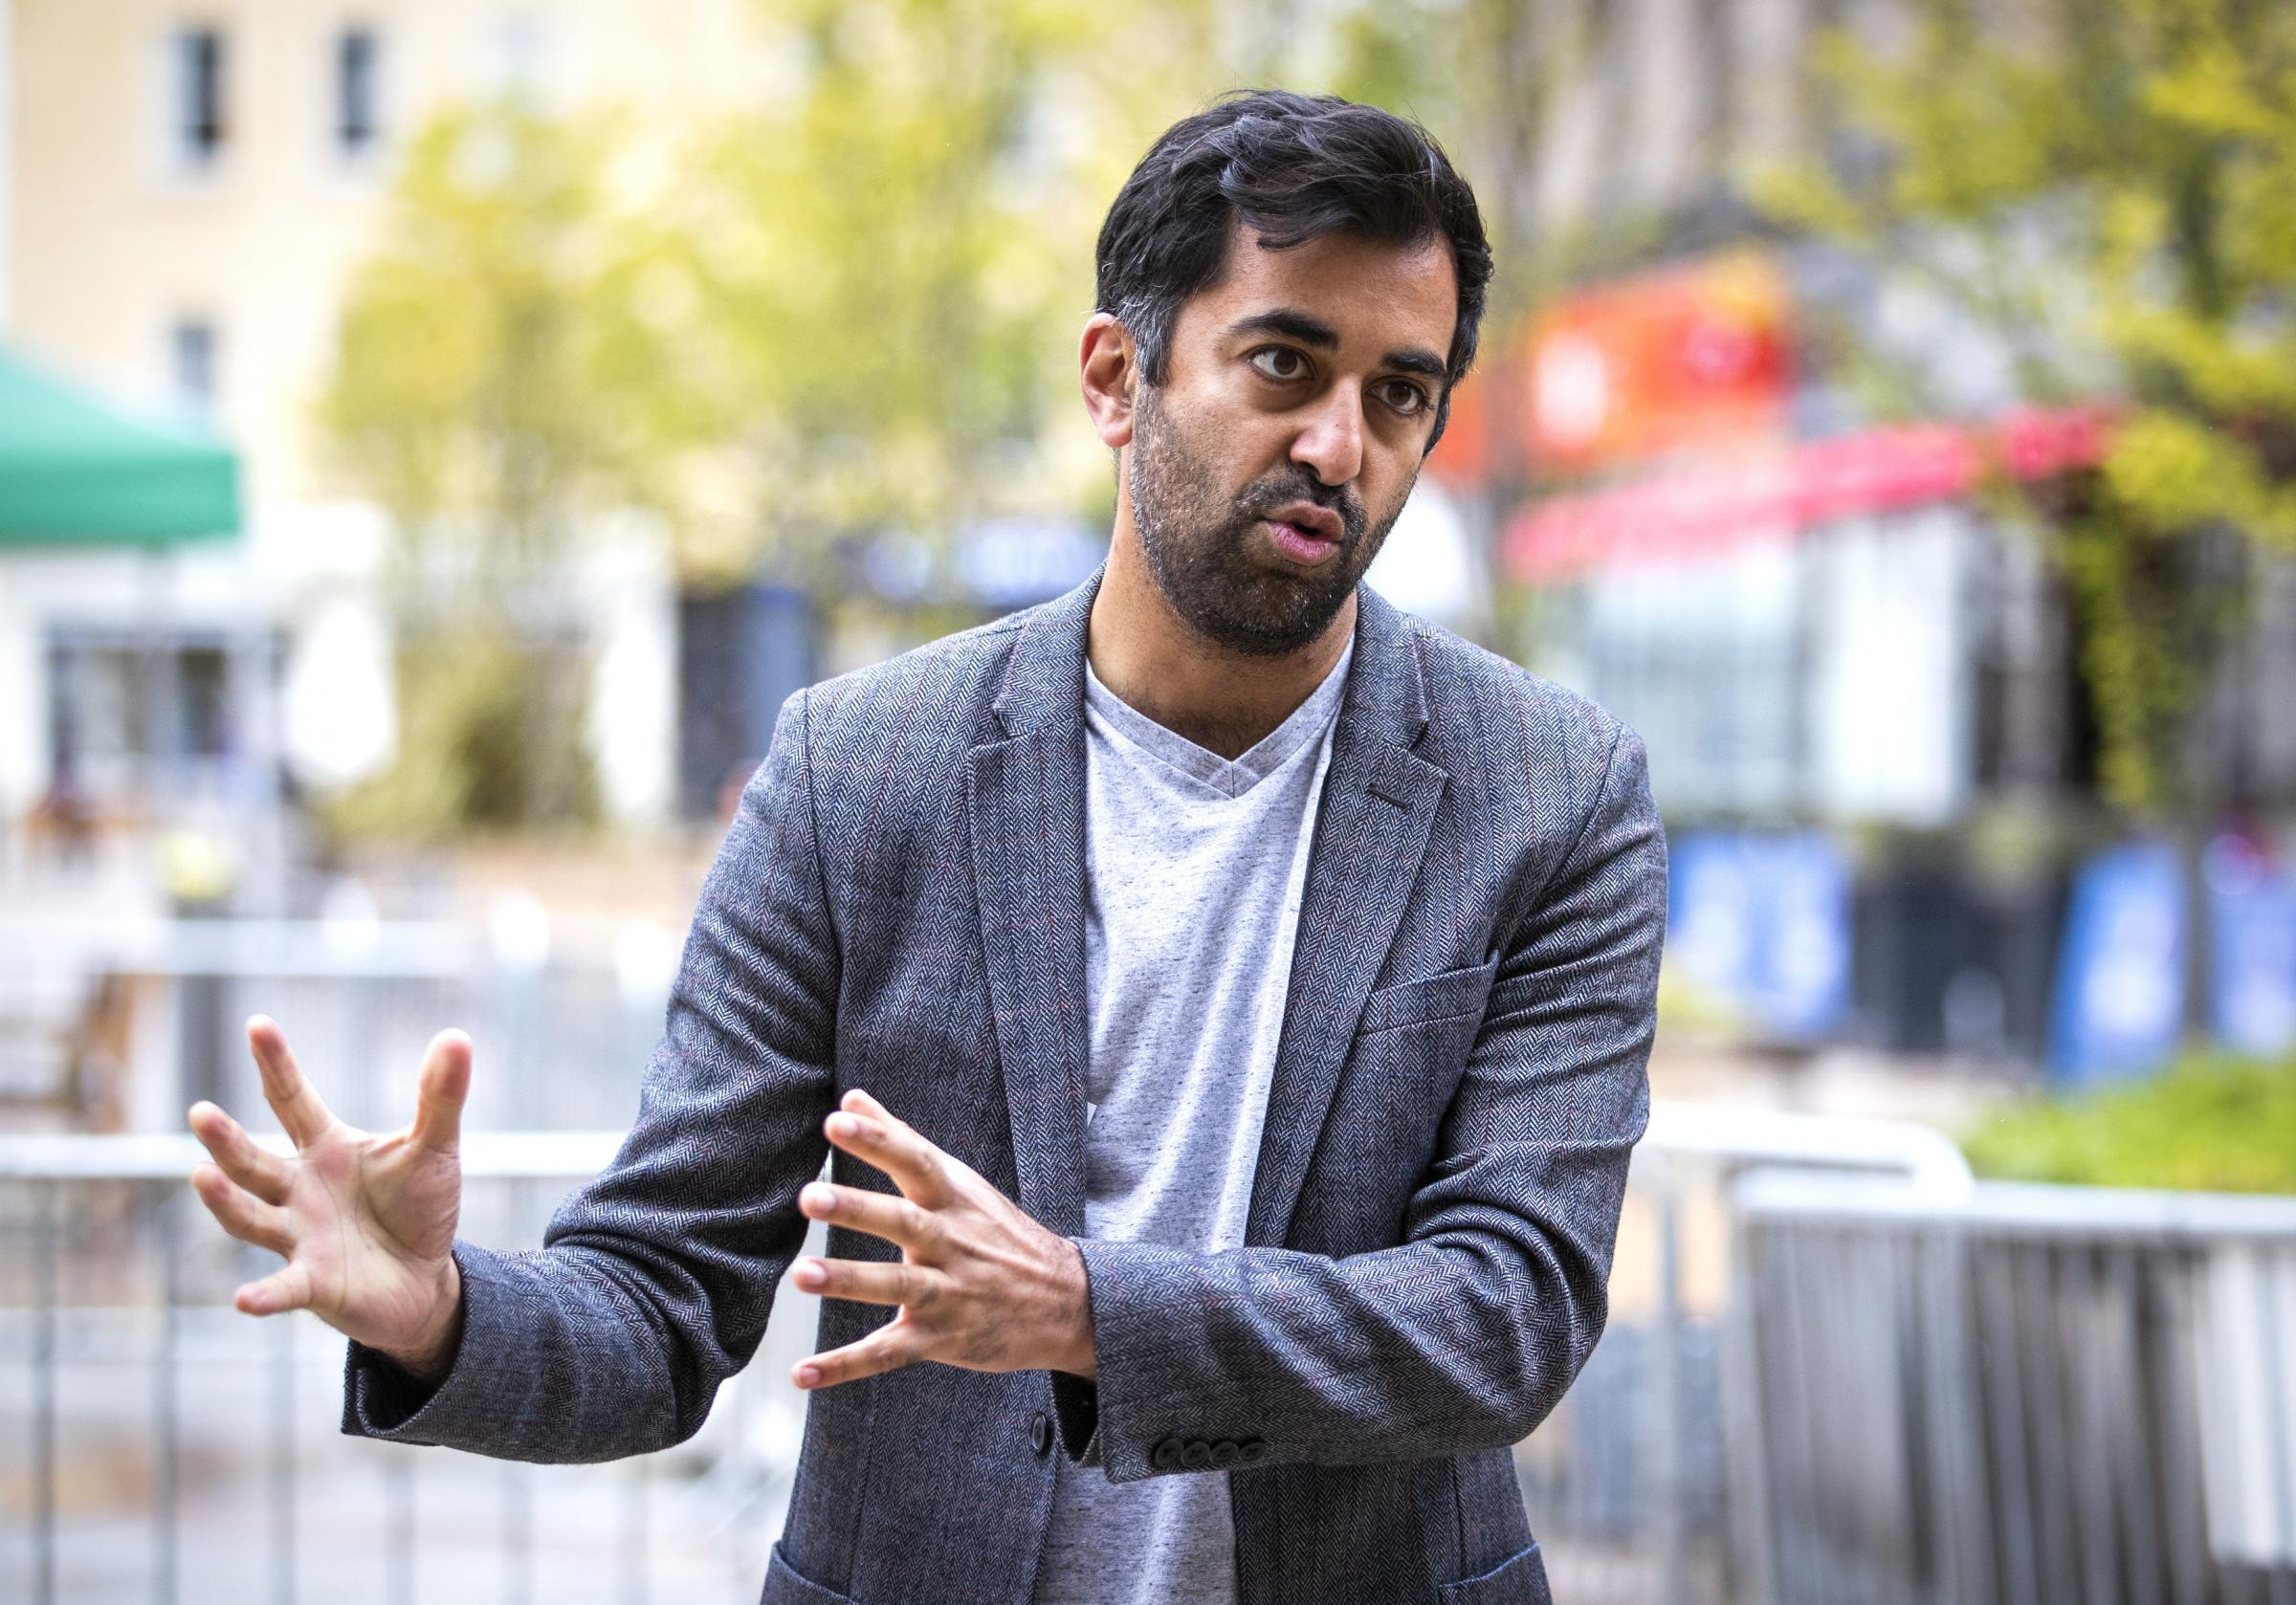 Scotland on track to meet vaccine target despite Pfizer shortage, Humza Yousaf says